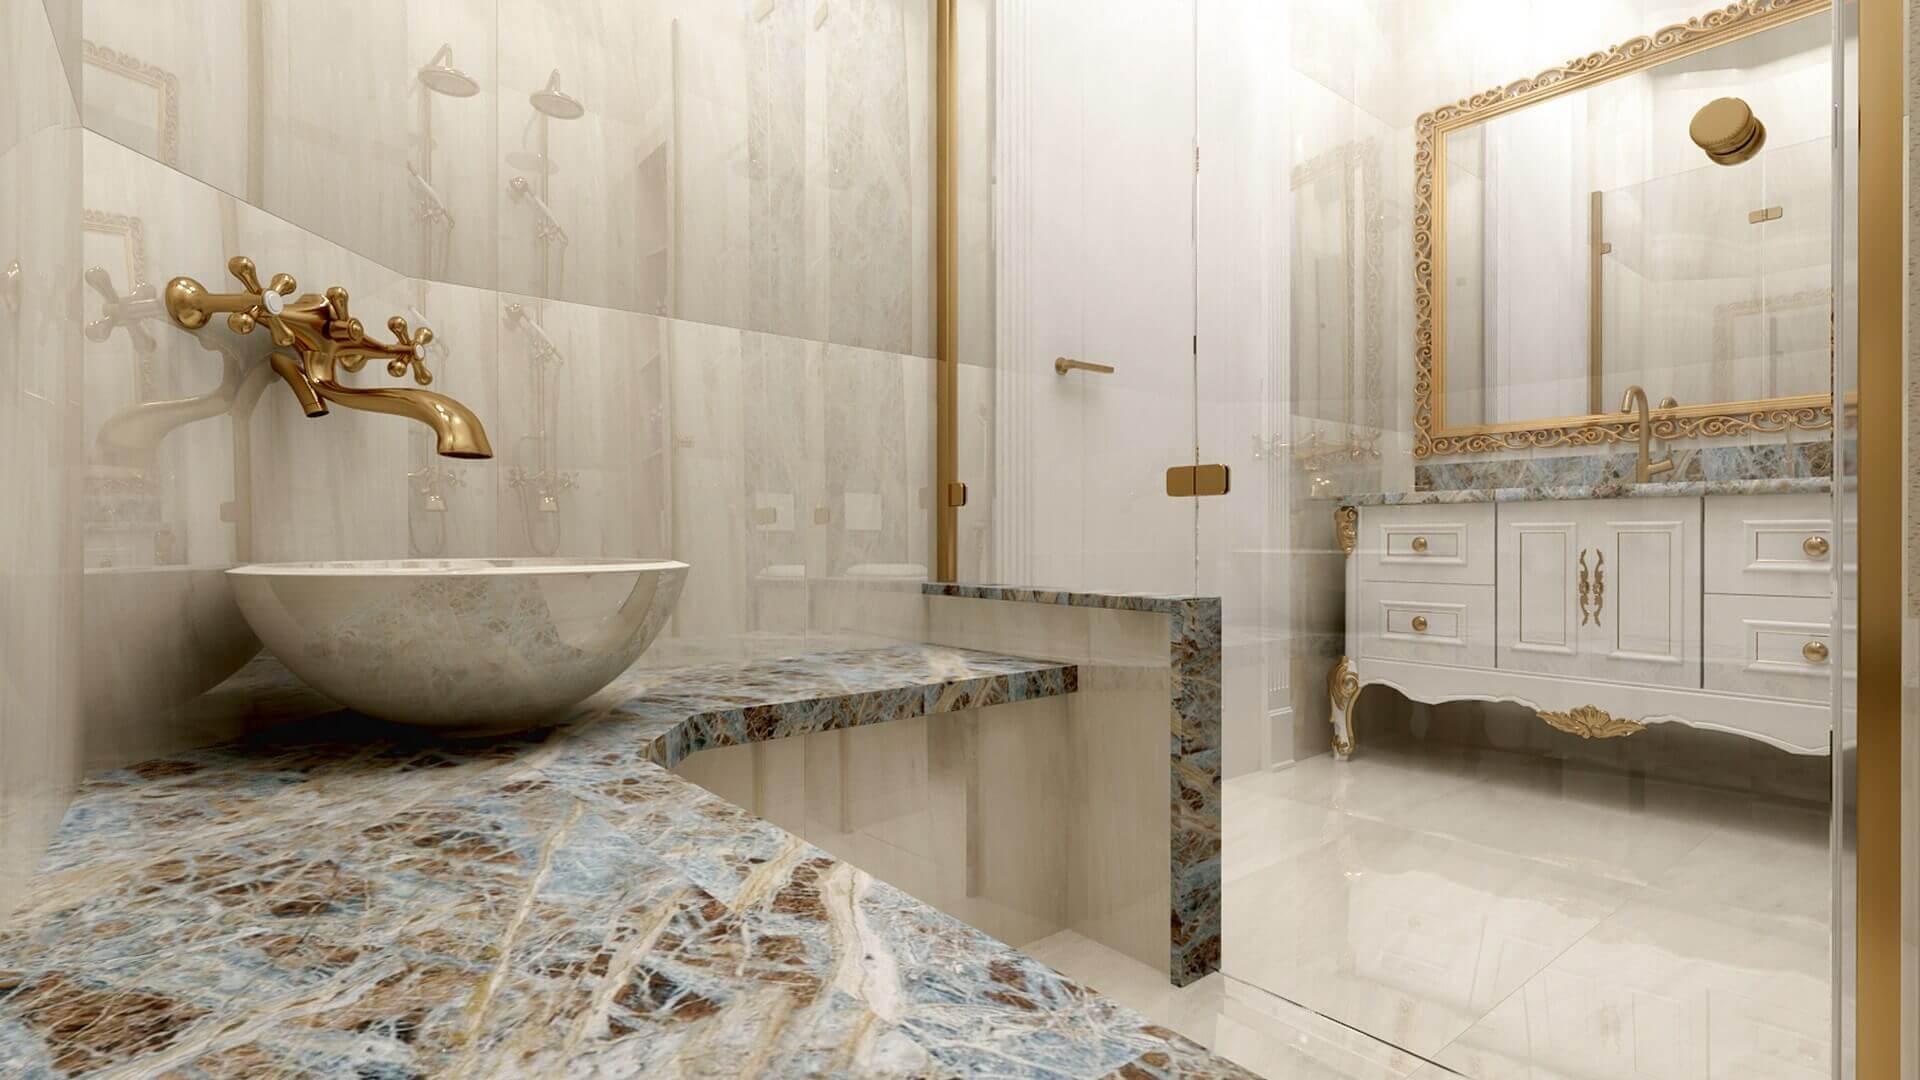 home inspiration 3303 S. Aslan Flat Residential